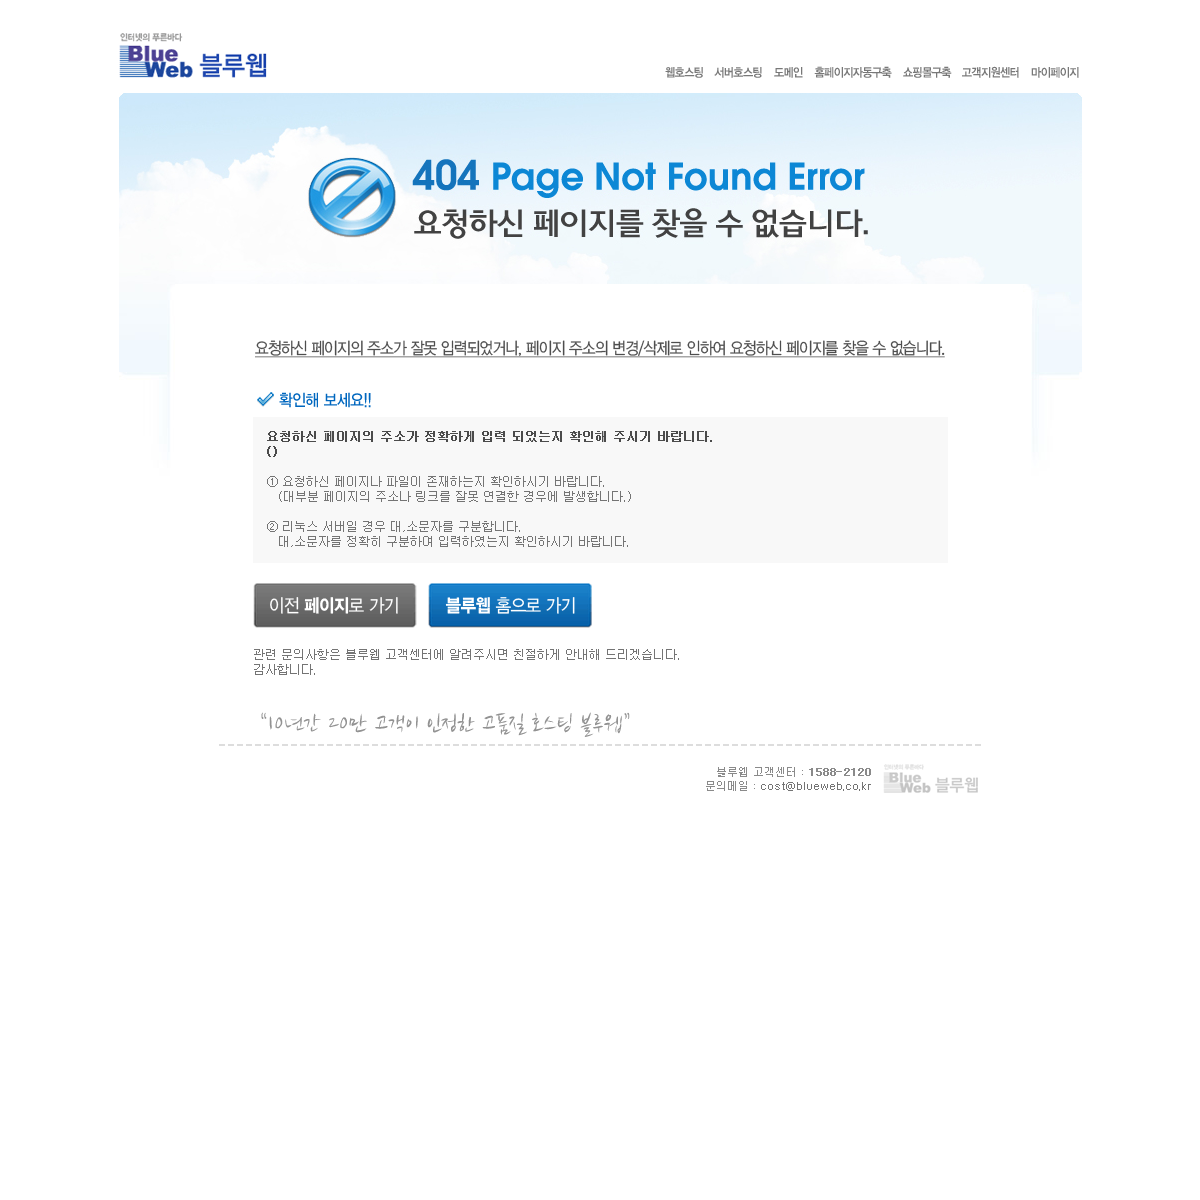 404Error 요청하신 페이지를 찾을 수 없습니다.